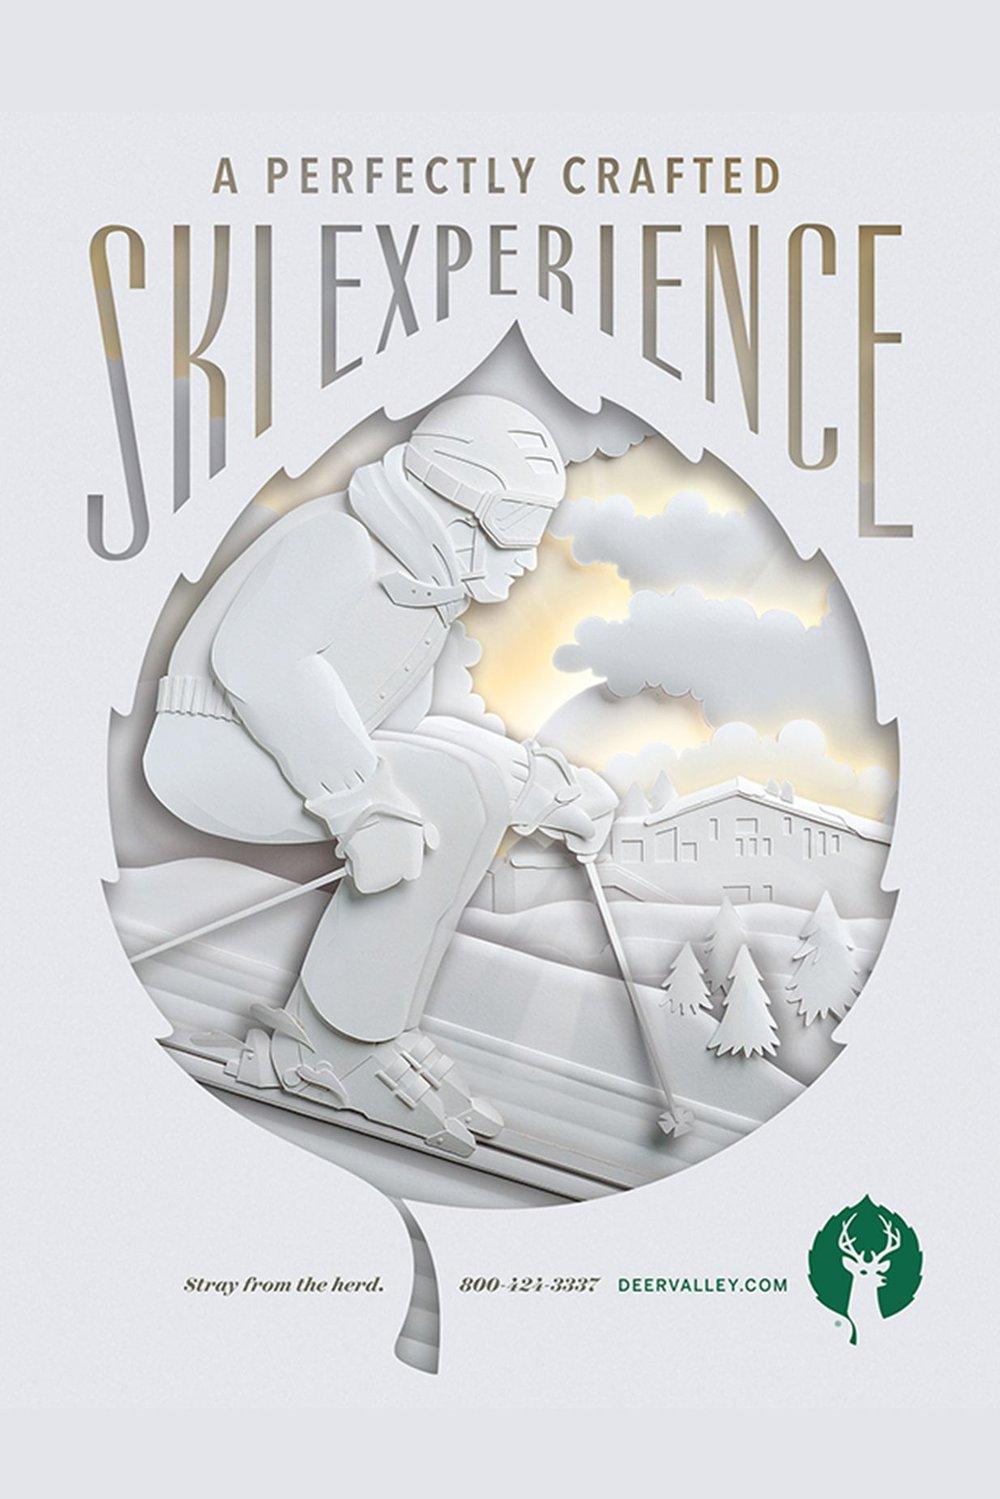 Full hand cut skier marketing brochure for Deer Valley